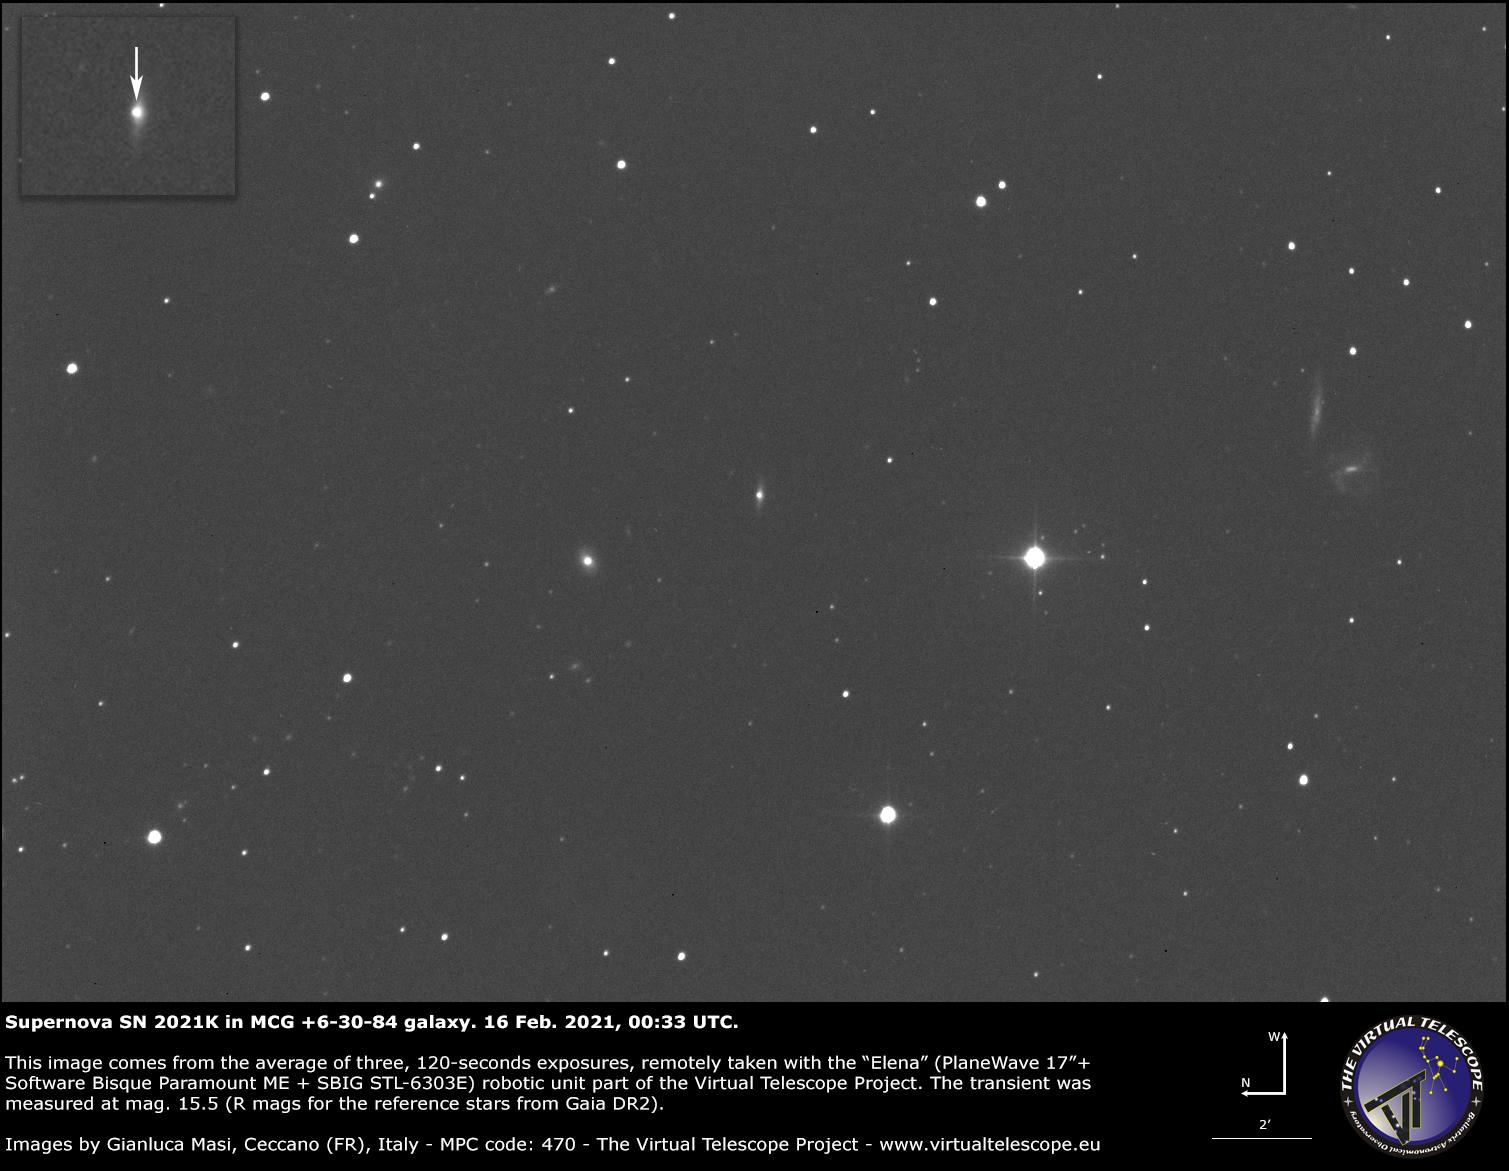 Supernova SN 2021K in MCG +6-30-84 : 16 Feb. 2021.